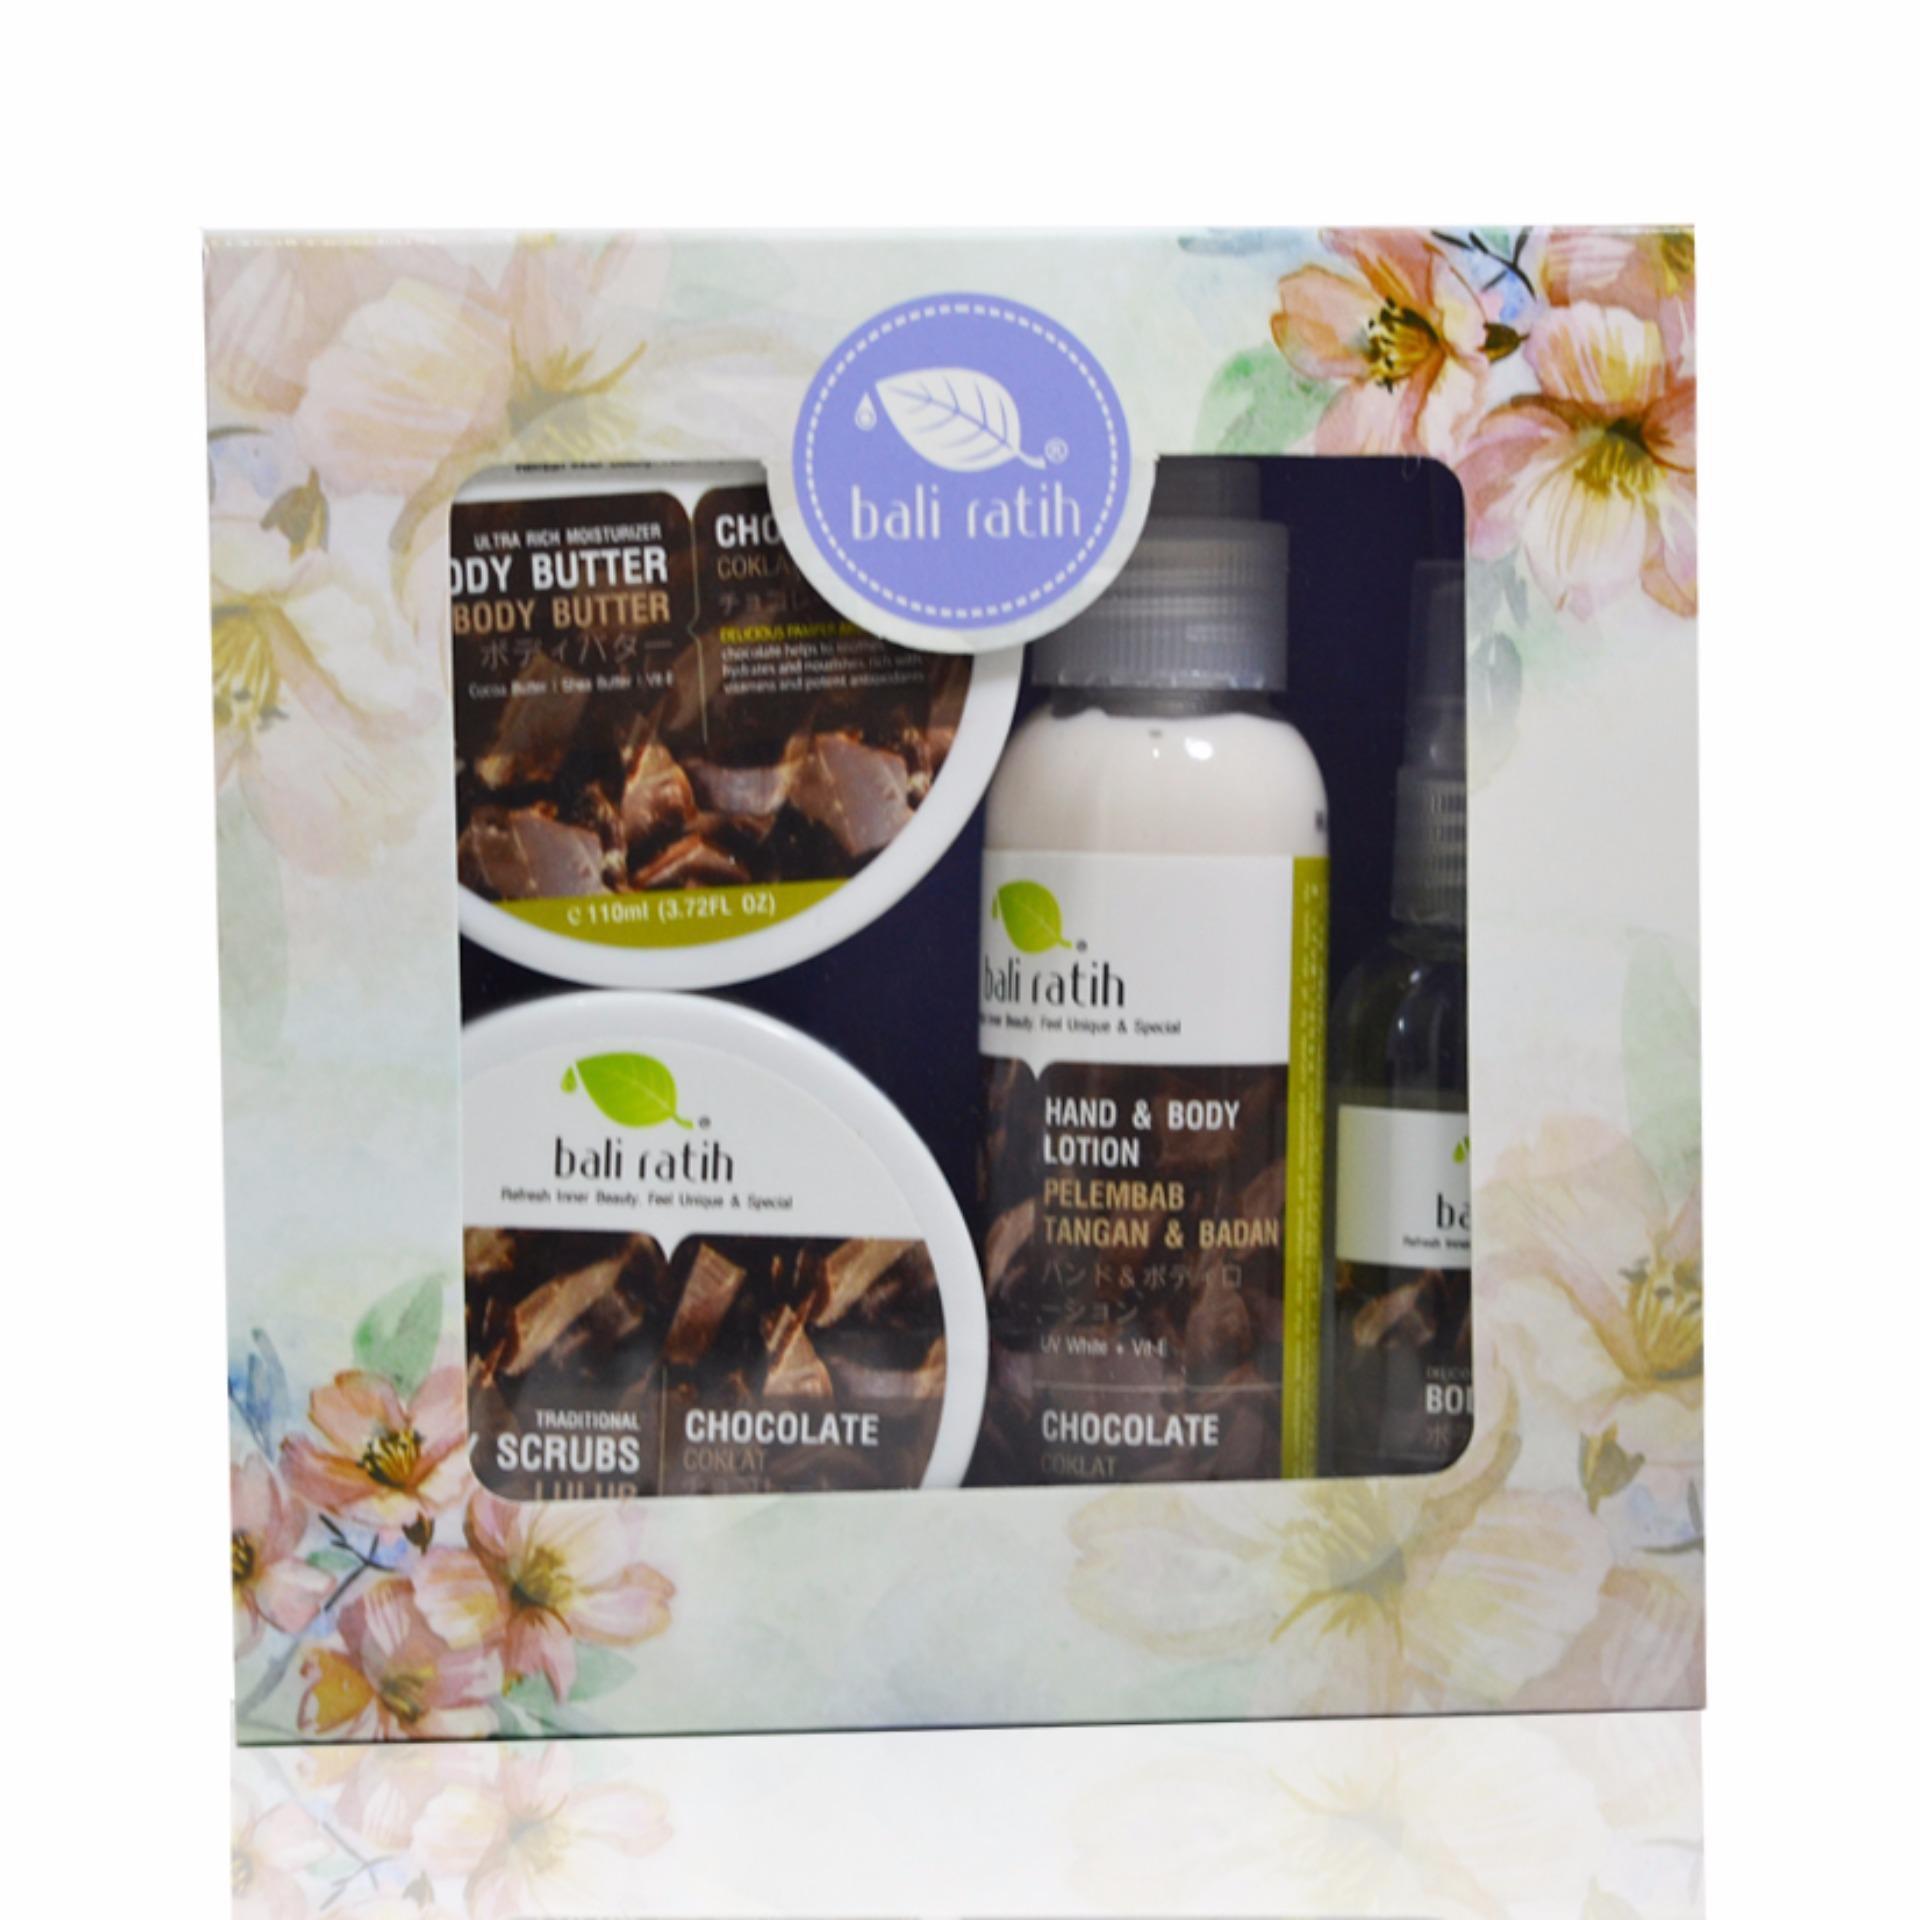 Flash Sale Paket Bali Ratih Chocolate Box